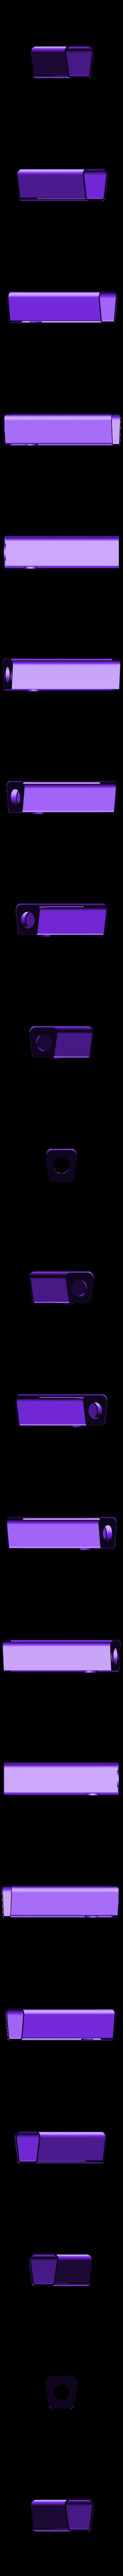 hammer-handle.stl Download free STL file Fix It Felix Hammer • 3D printer design, Adafruit